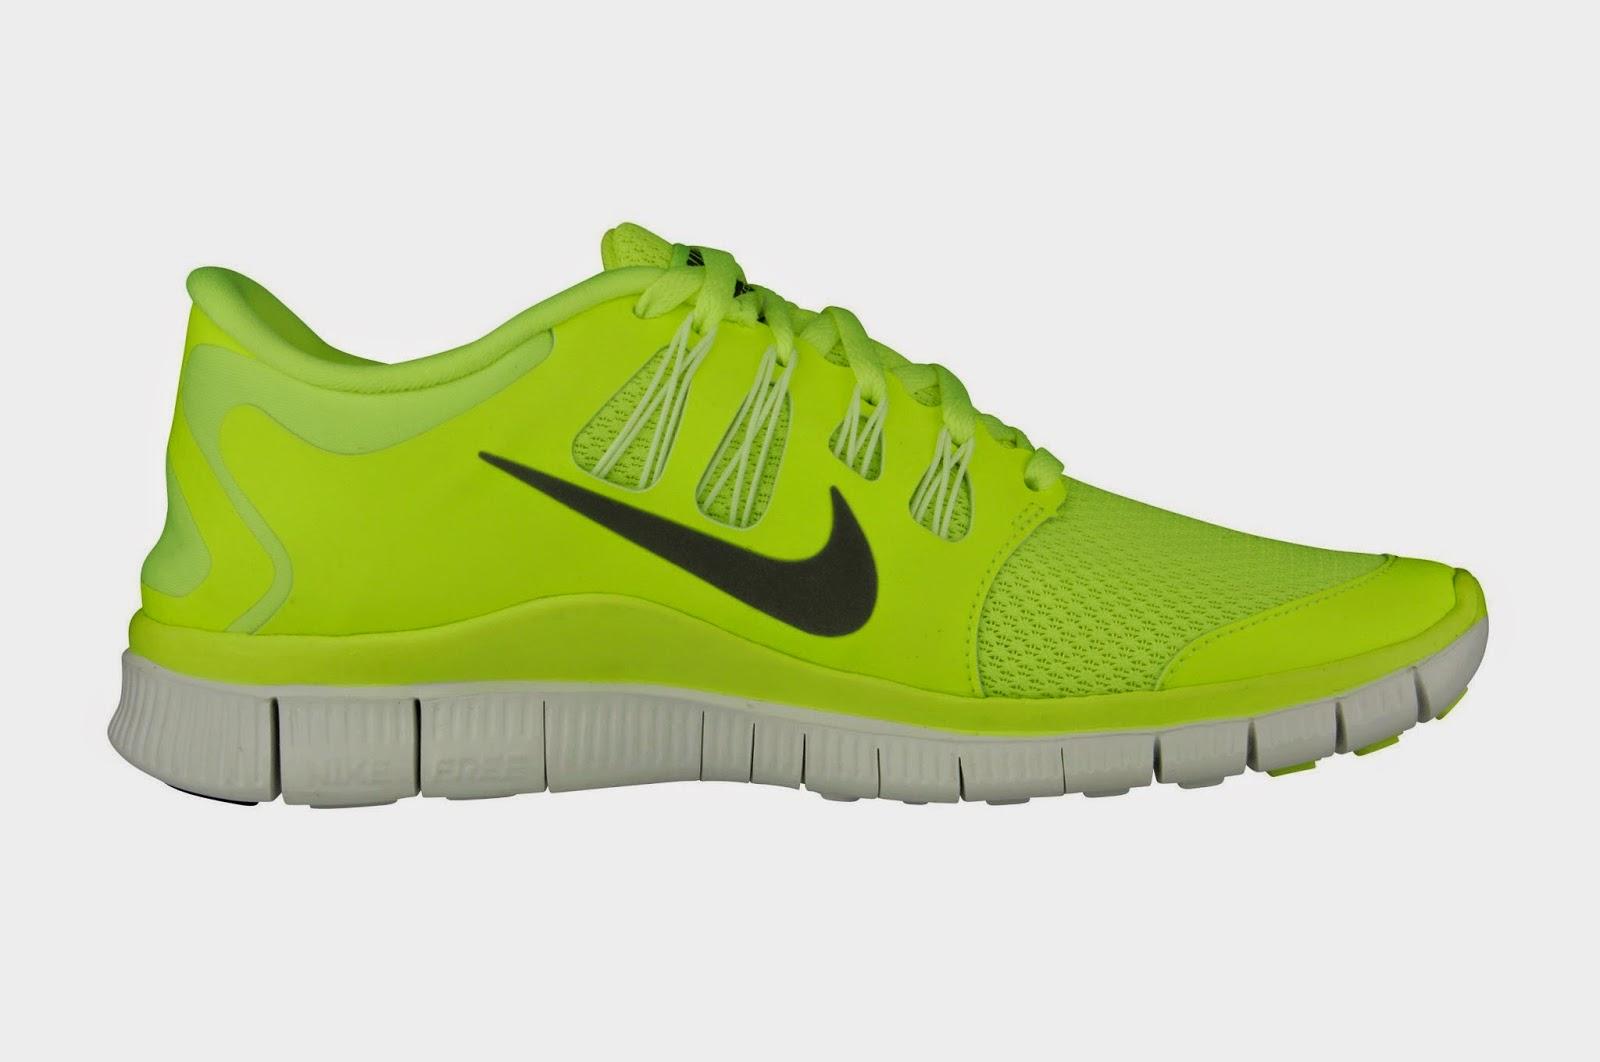 http://www.footlocker.eu/es/es/Calzados/Nike-Free-5-0-52.aspx/5241166602